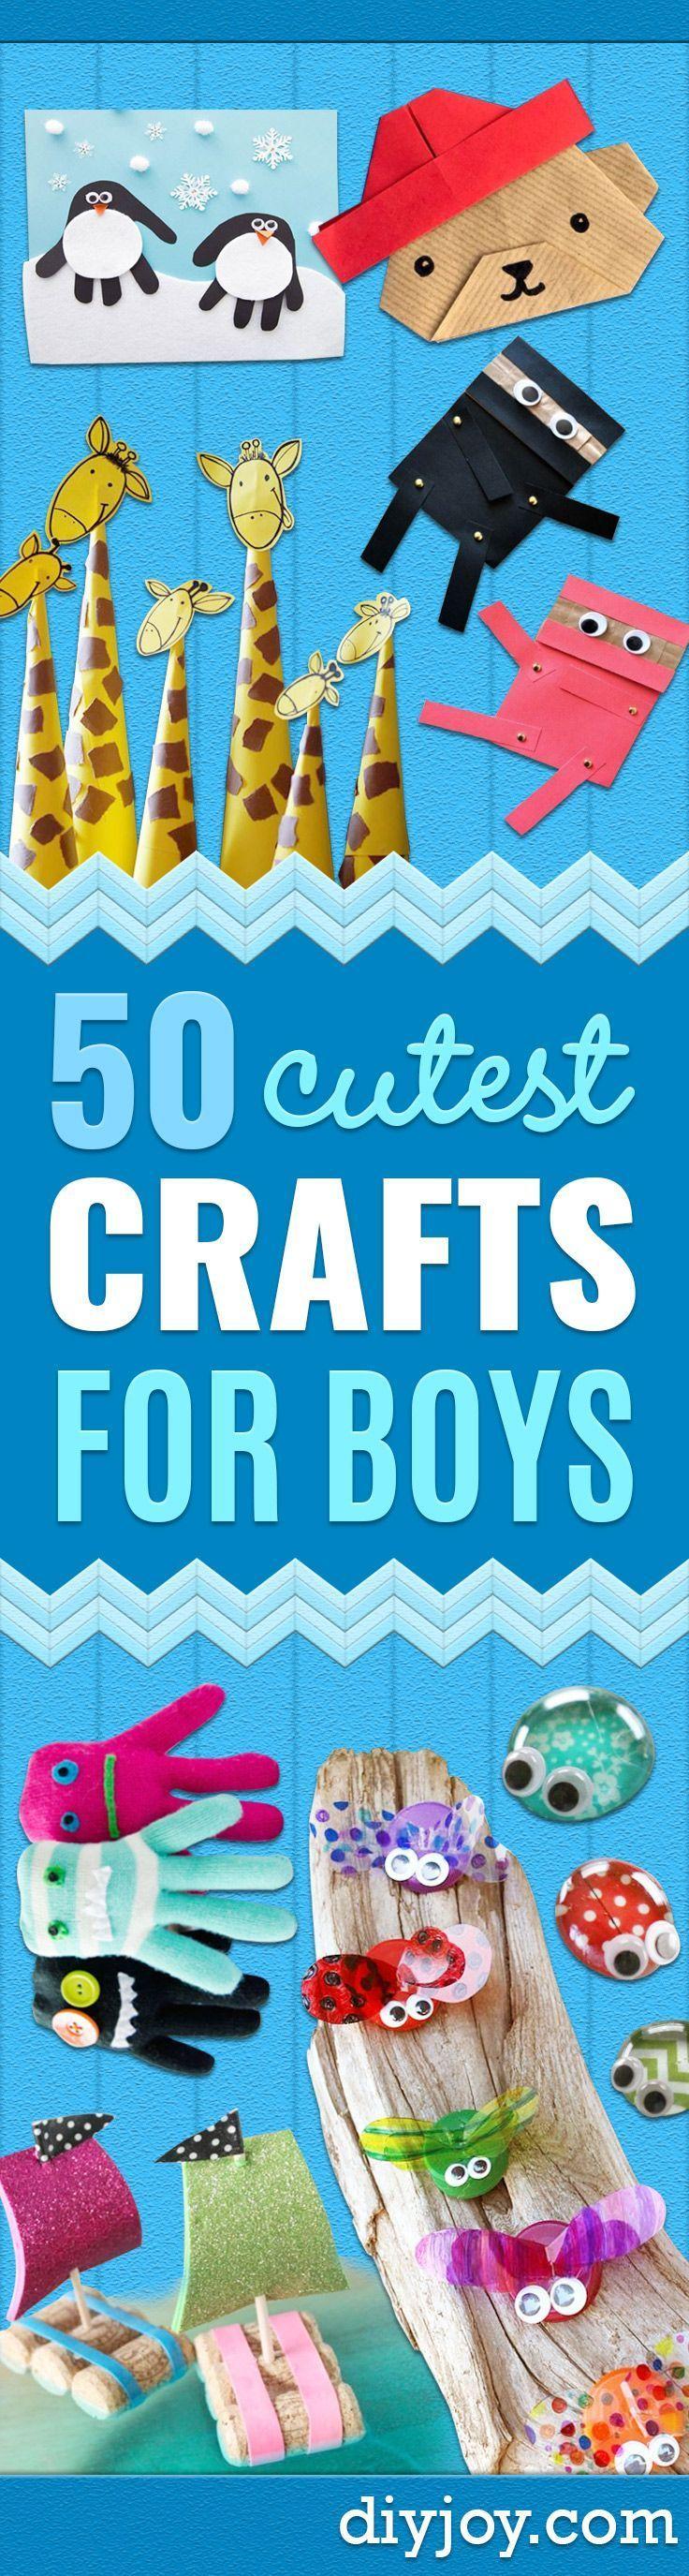 50 Cutest Crafts For Boys Diy Crafts Crafts For Boys Crafts